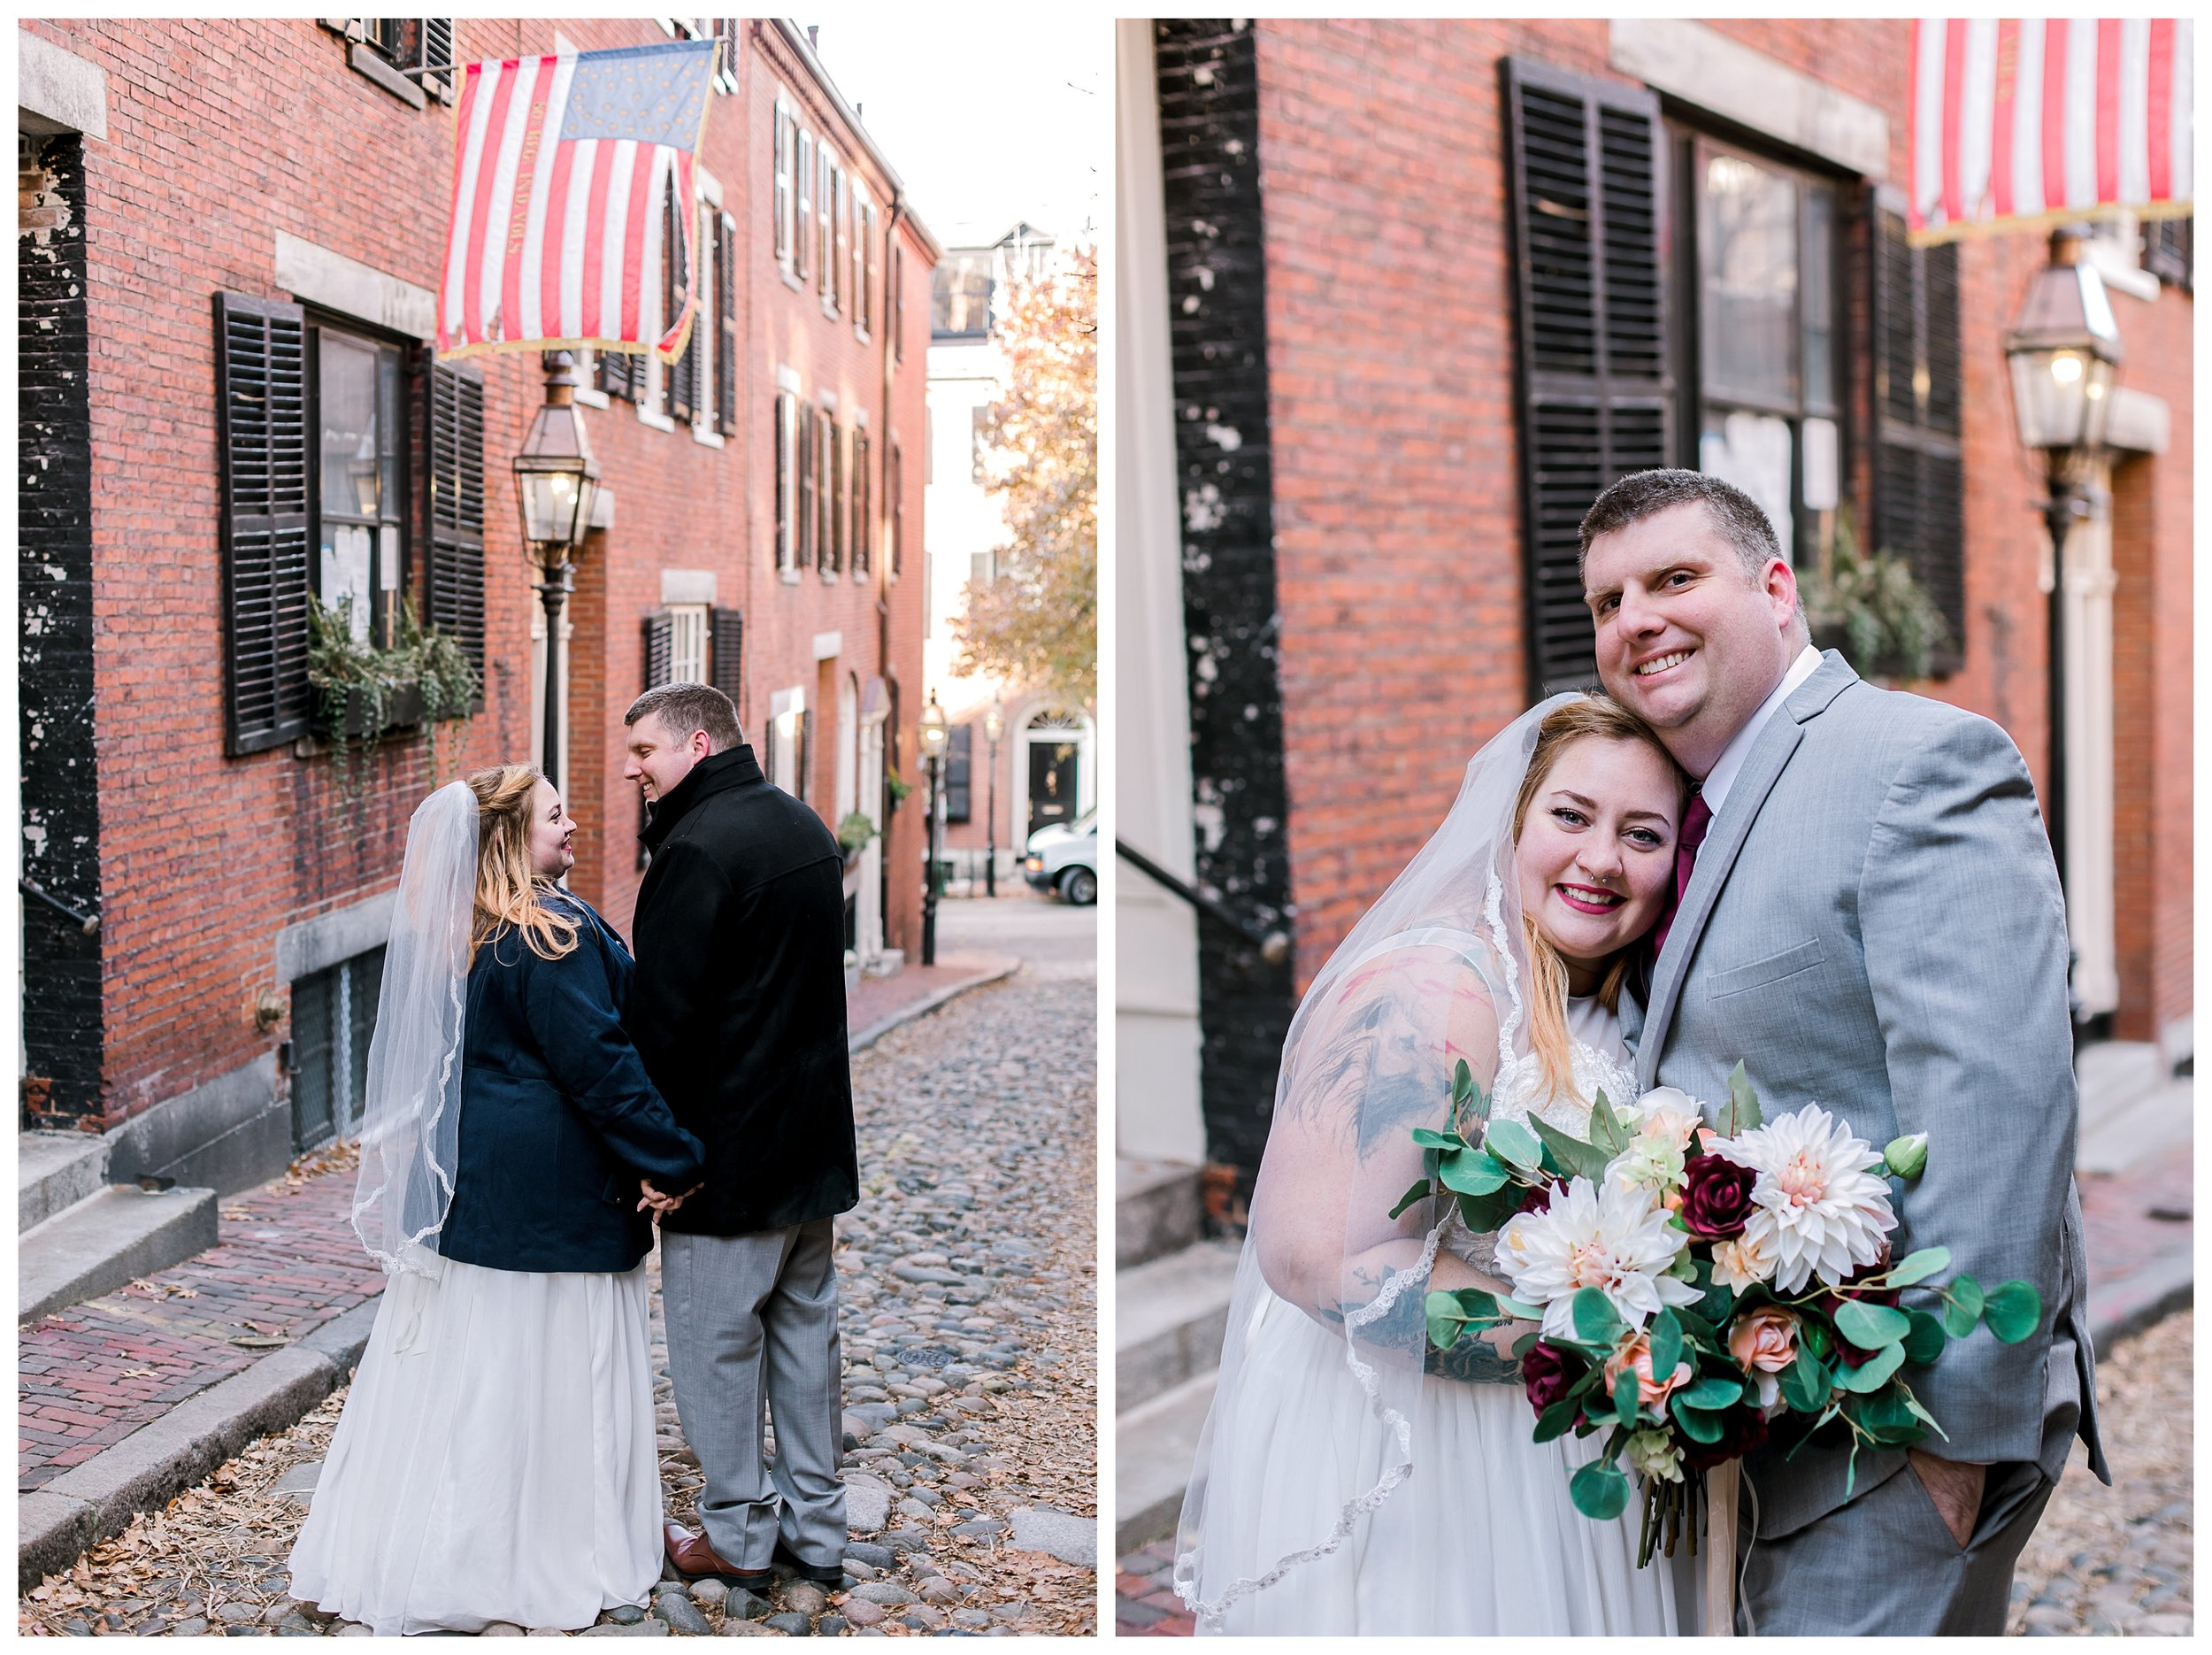 boston_acorn_street_elopement_photos_erica_pezente_photography (3).jpg